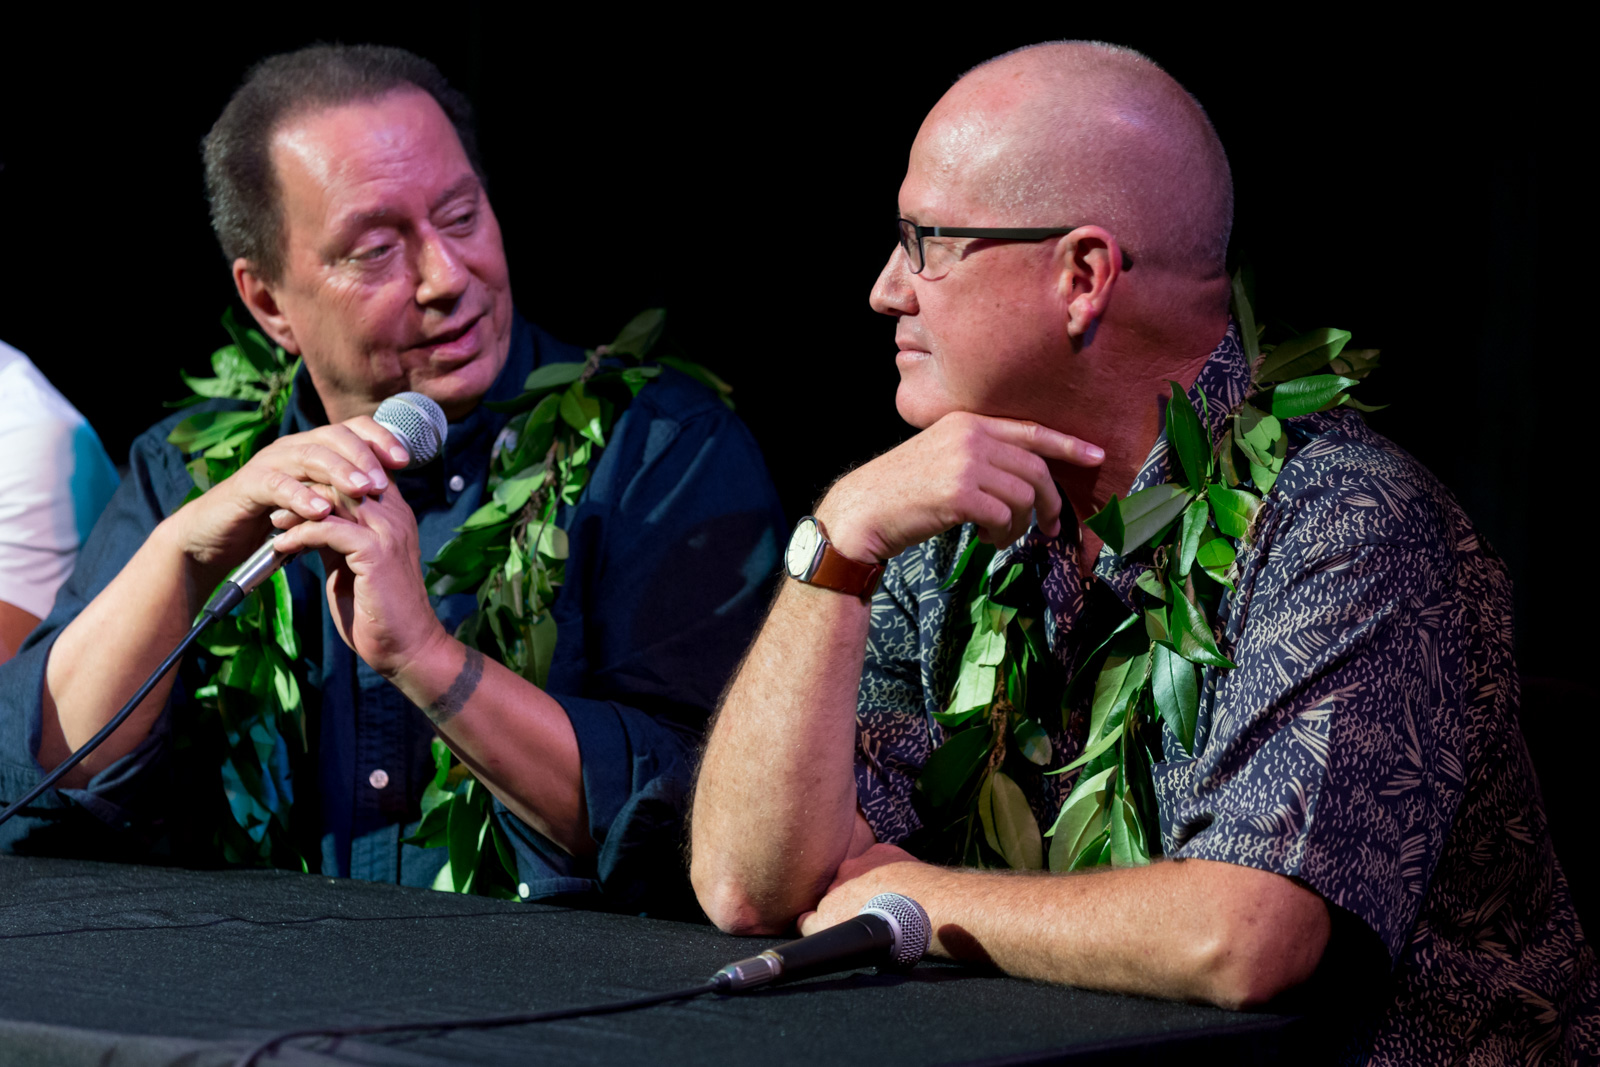 Dr. Puakea Nogelmeier and Professor Kī'ope Raymond discuss Hawaiian language